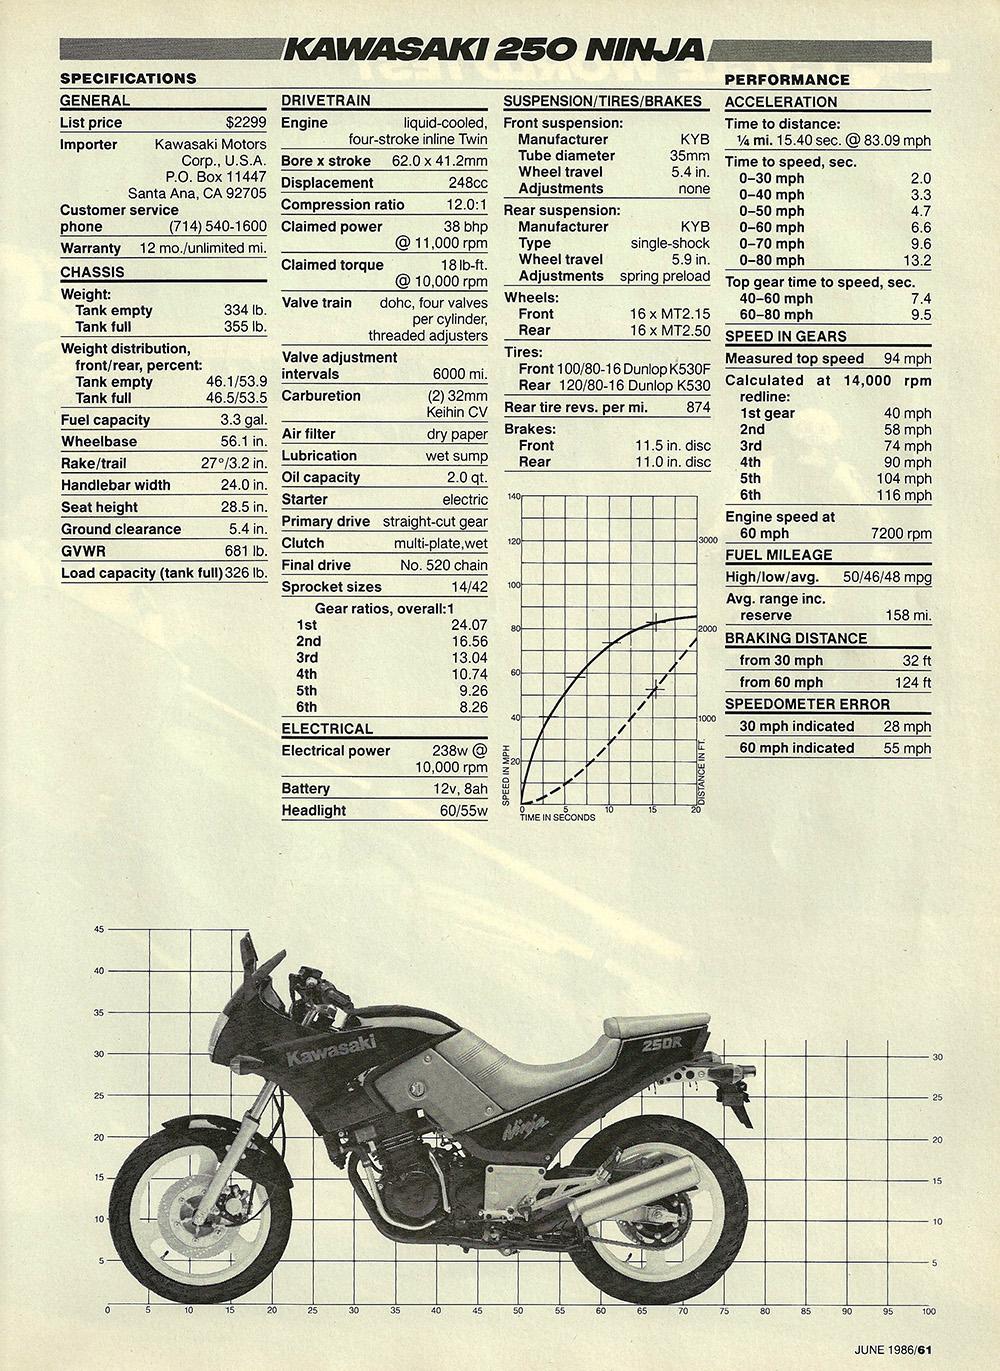 1986 Kawasaki Ninja 250 road test 04.jpg